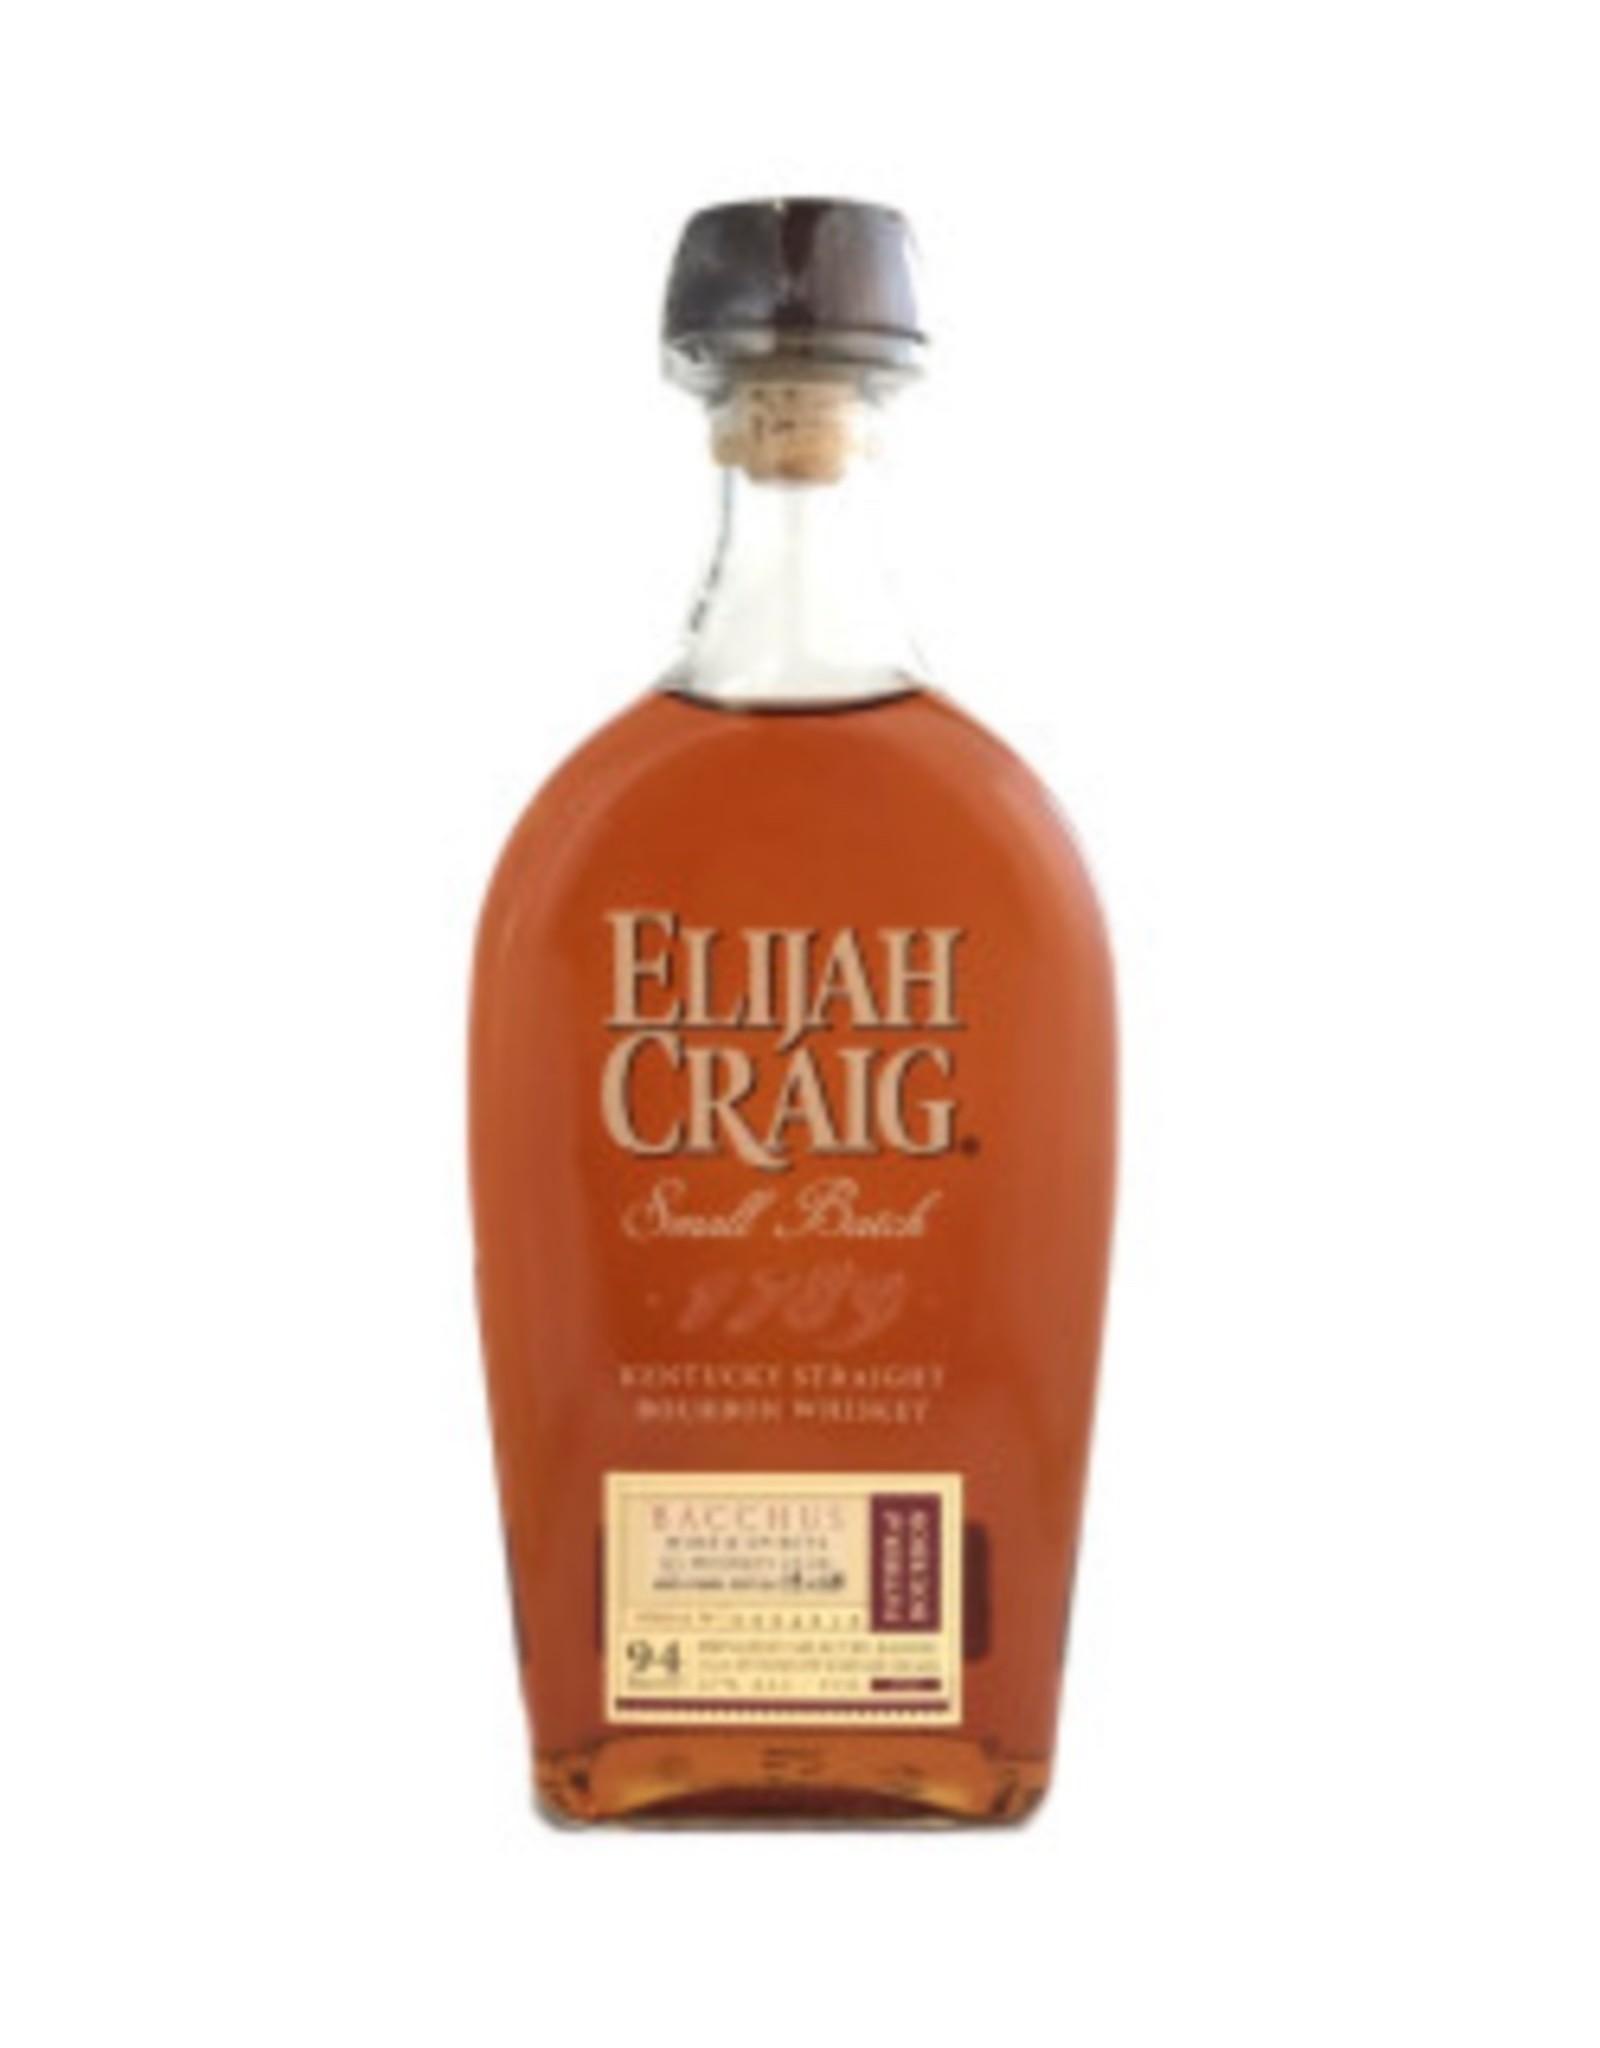 Elijah Craig 10.5 Year Bacchus Barrel #03